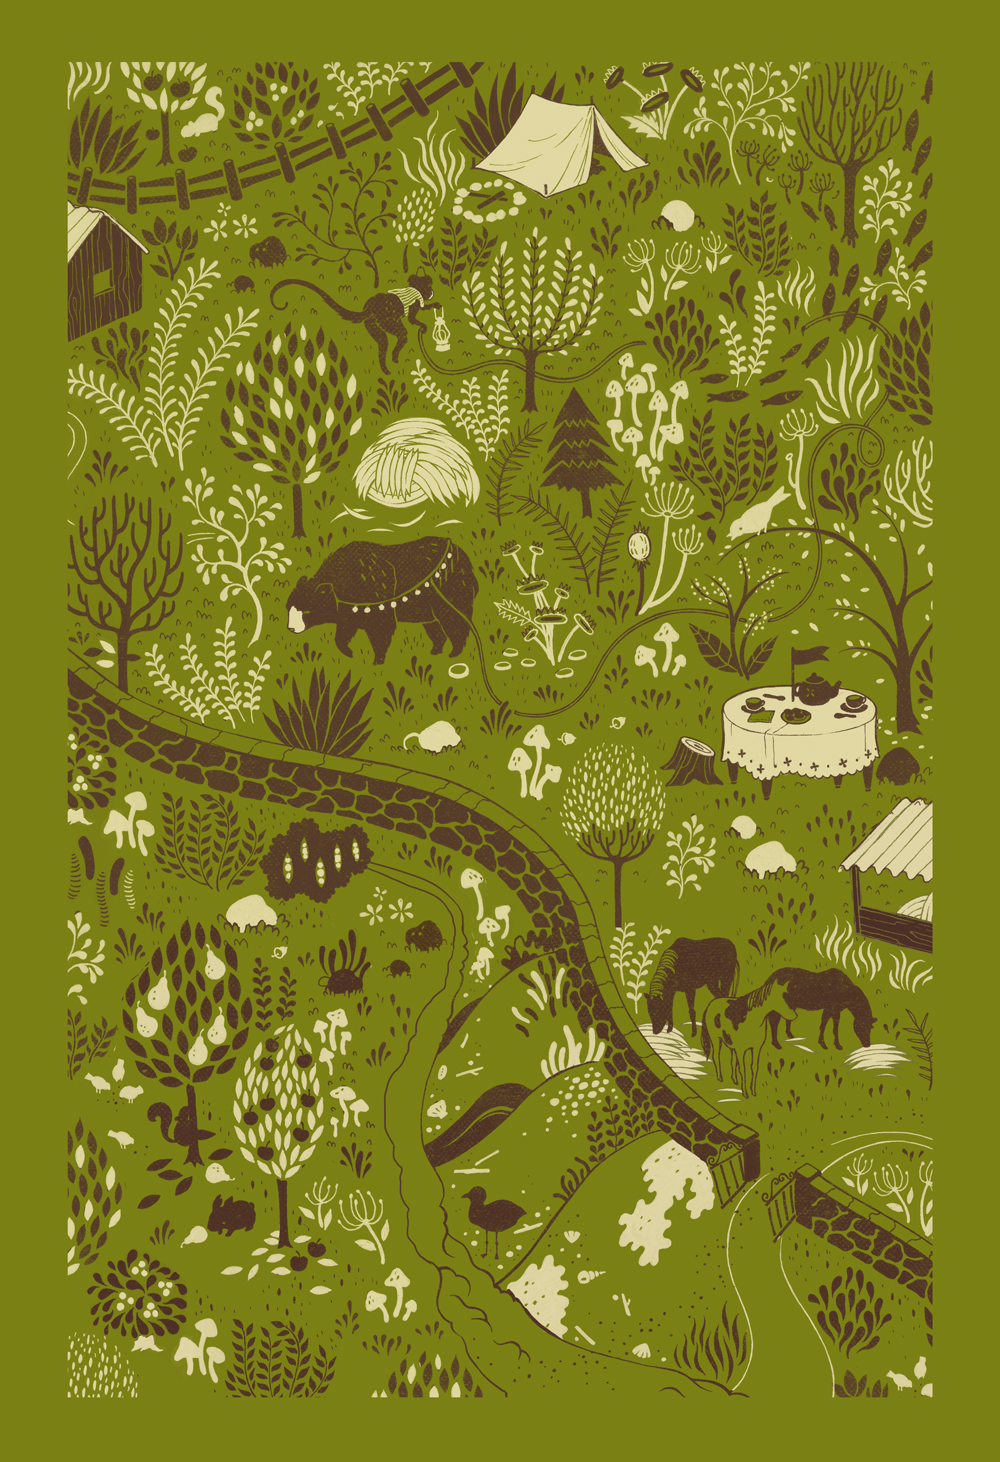 Monkey and Bear pattern by teaganwhite